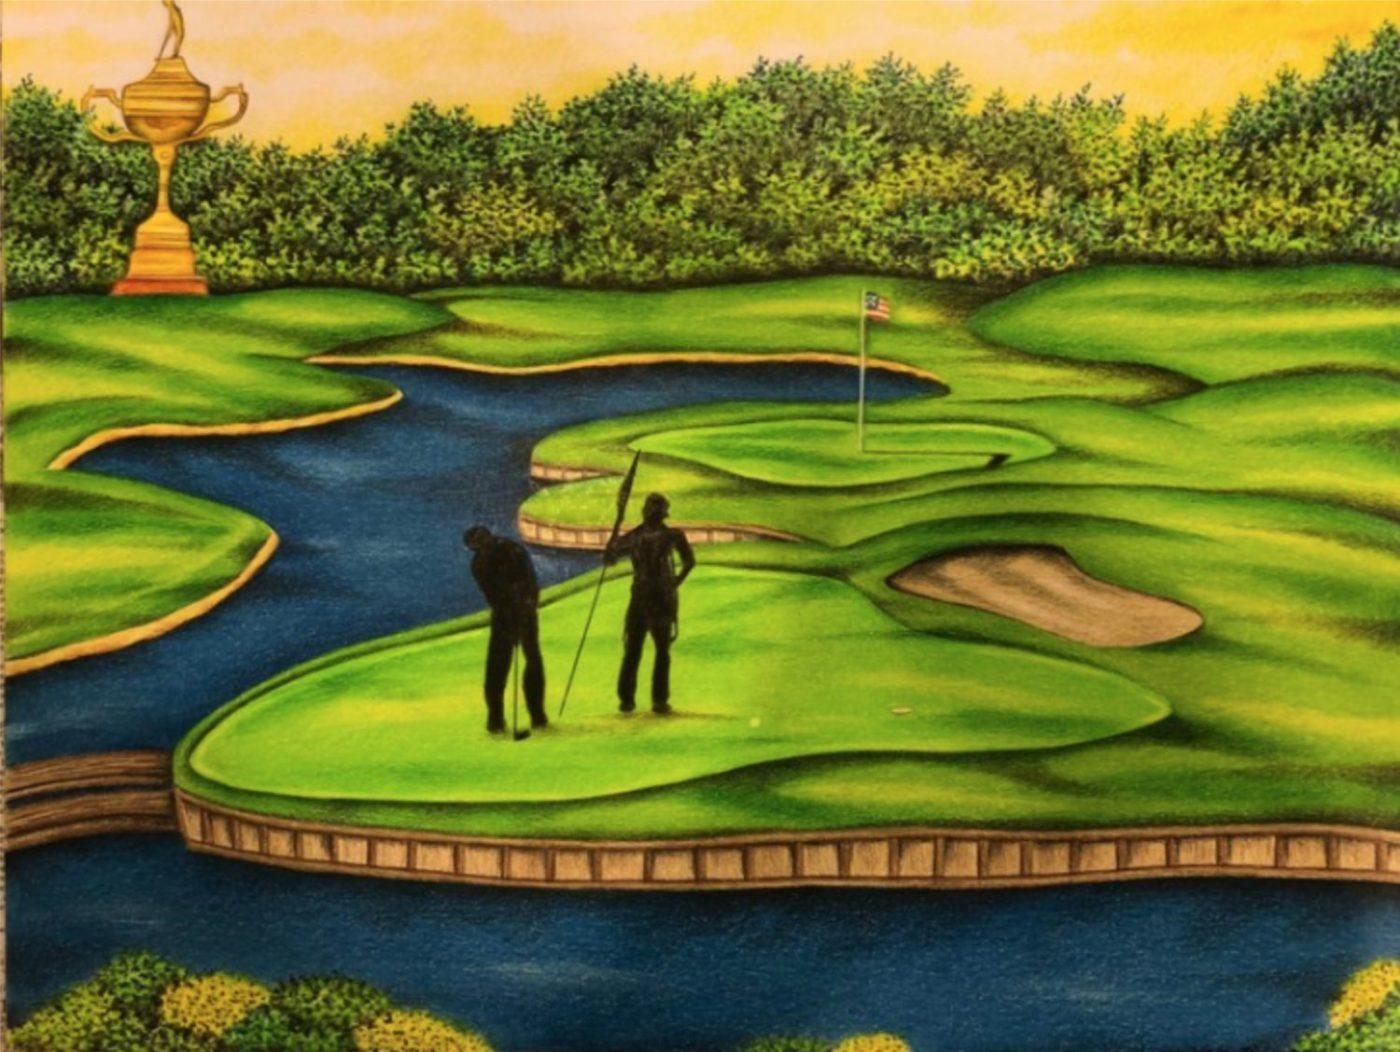 Golf-Dream-art-by-Valentino-Dixon-valentinodixon.com_-1400x1052, Tee time, Behind Enemy Lines